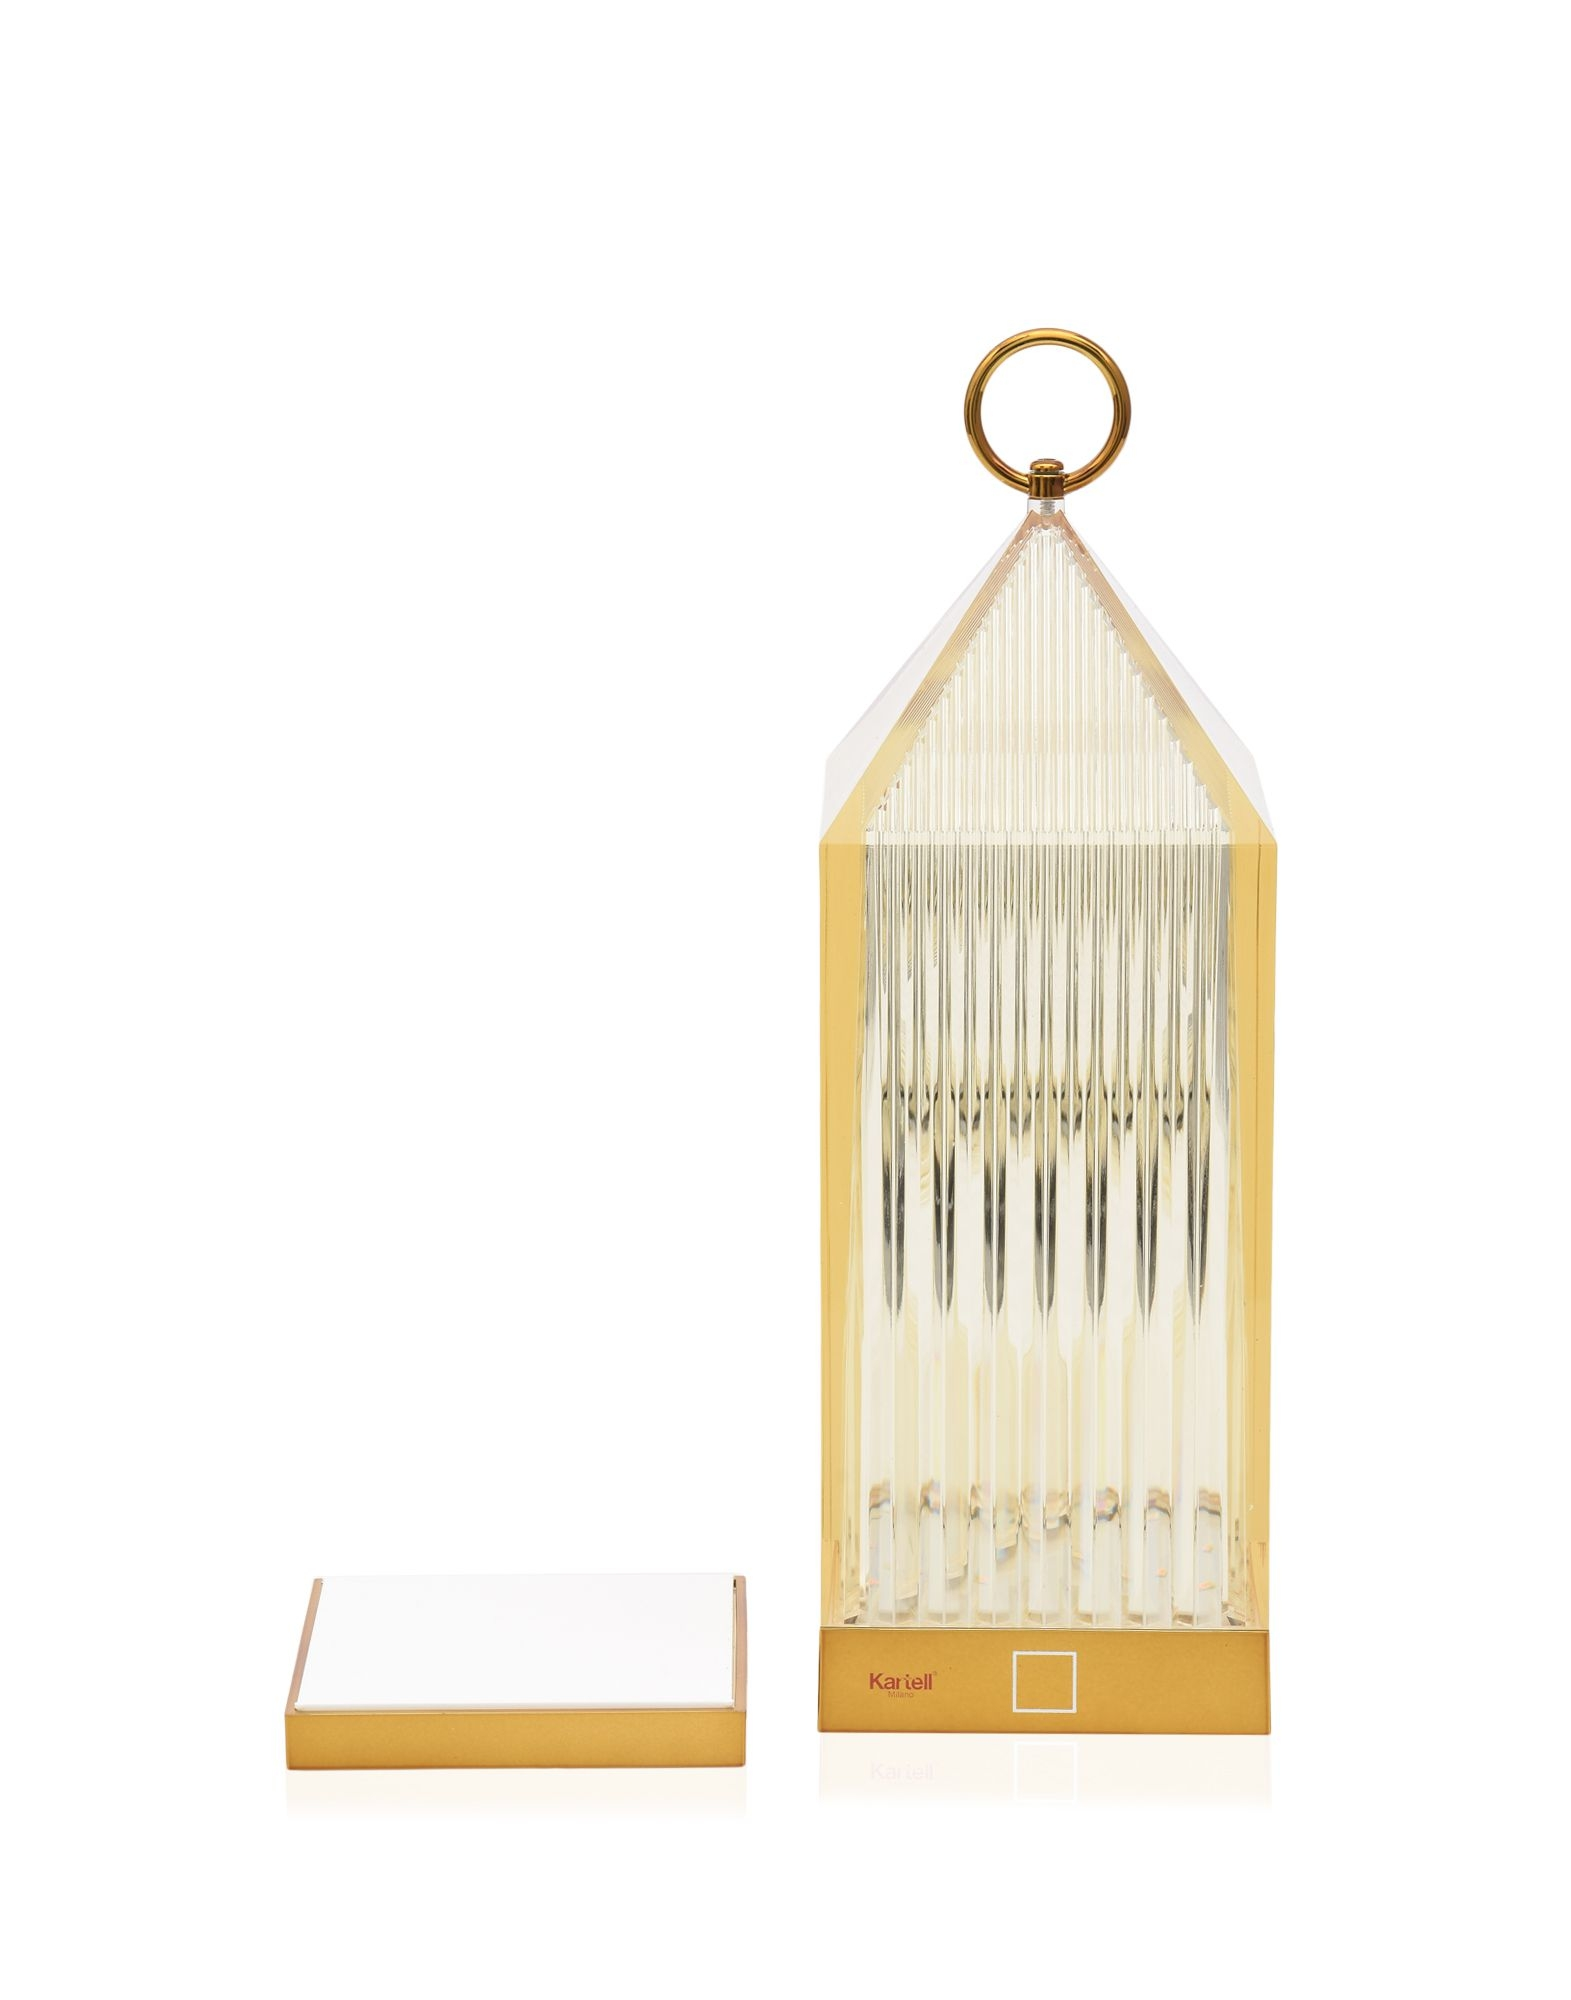 Lampa portabila de exterior Kartell Lantern design Fabio Novembre 1 2W LED chihlimbar transparent poza